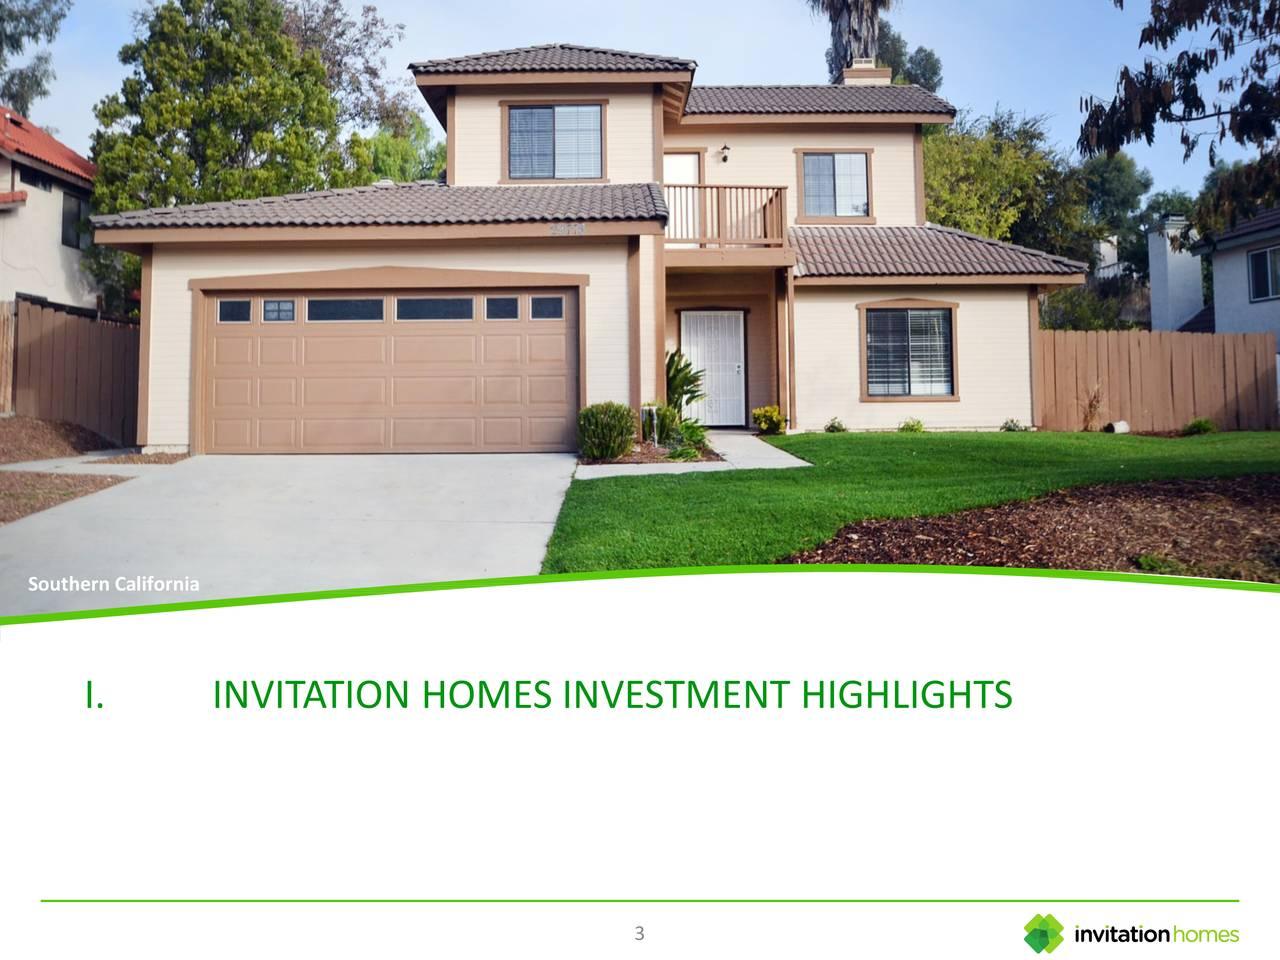 Invitation homes invh presents at the 2018 citi global property i invitation homes investment highlights 3 stopboris Choice Image